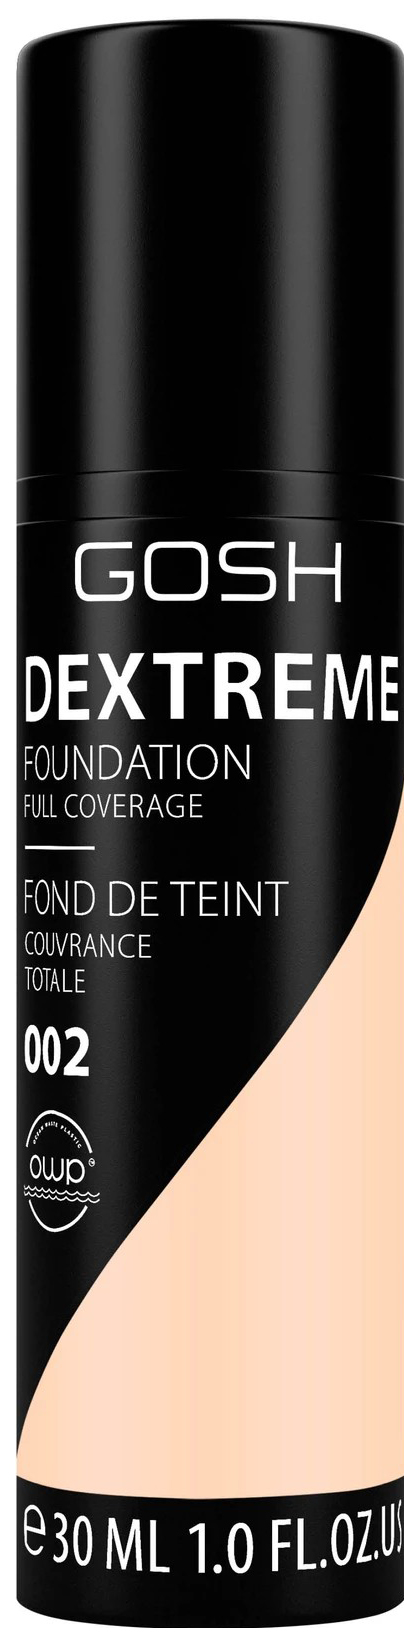 Тональный крем Gosh Dextreme Full Coverage Foundation 002 Ivory 30 мл